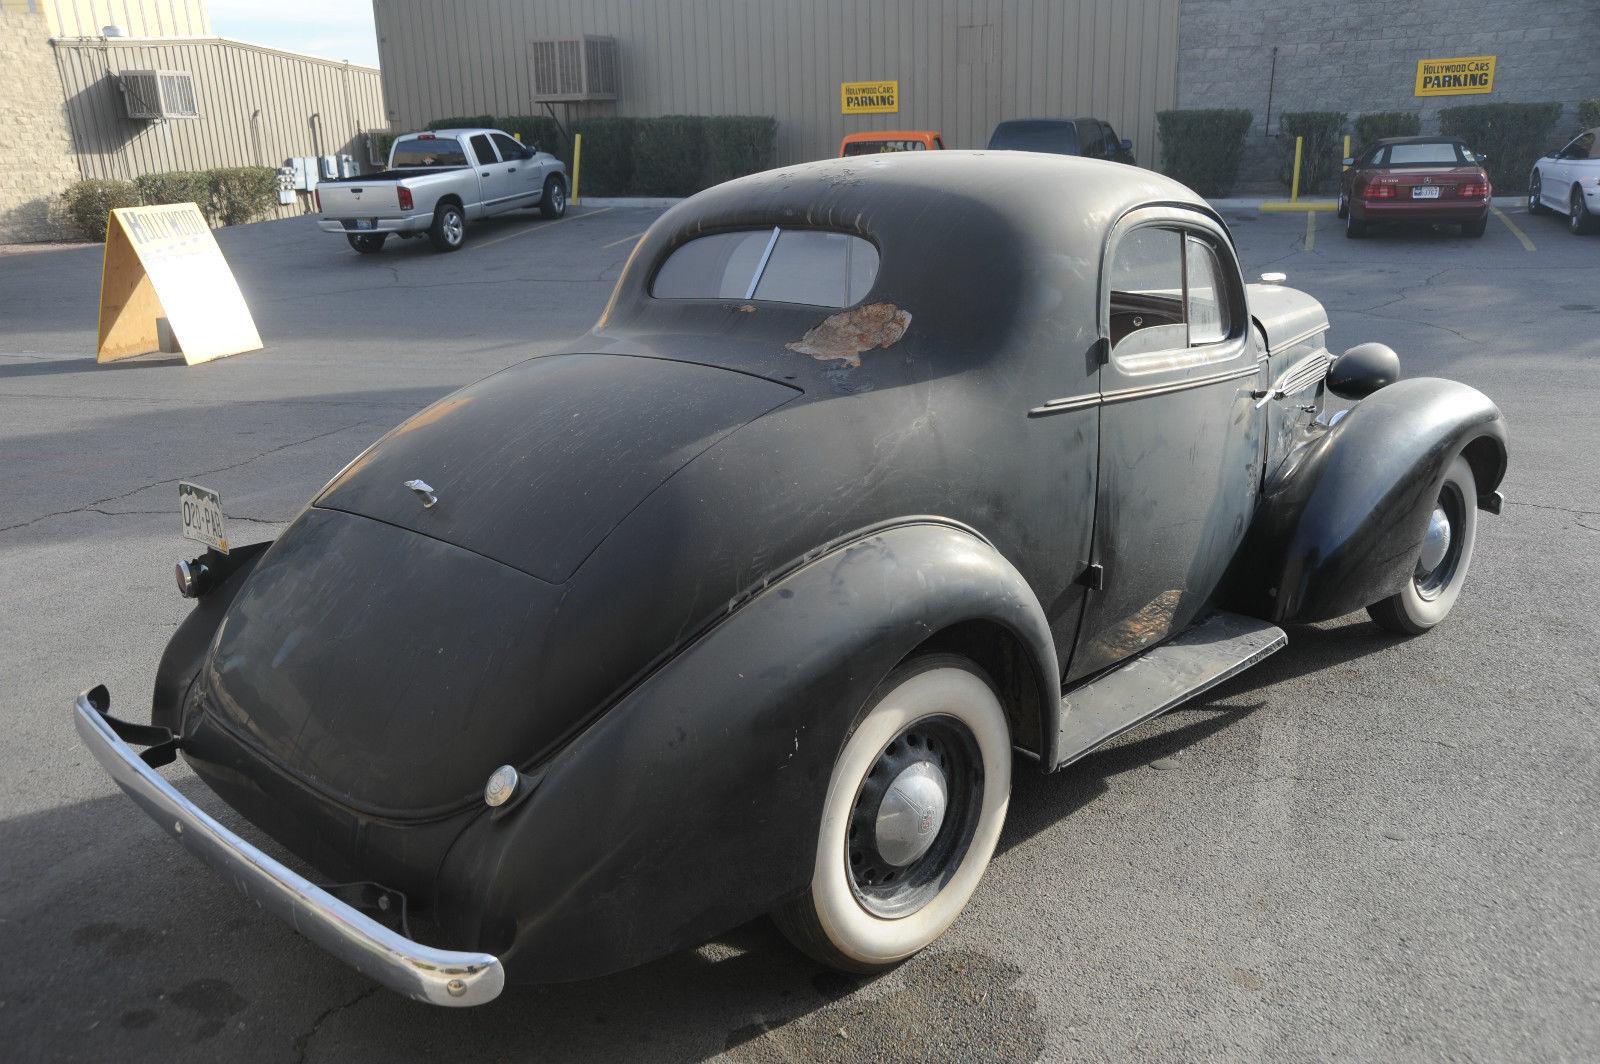 1935 Oldsmobile Coupe Suicide Doors, Original Barn Find